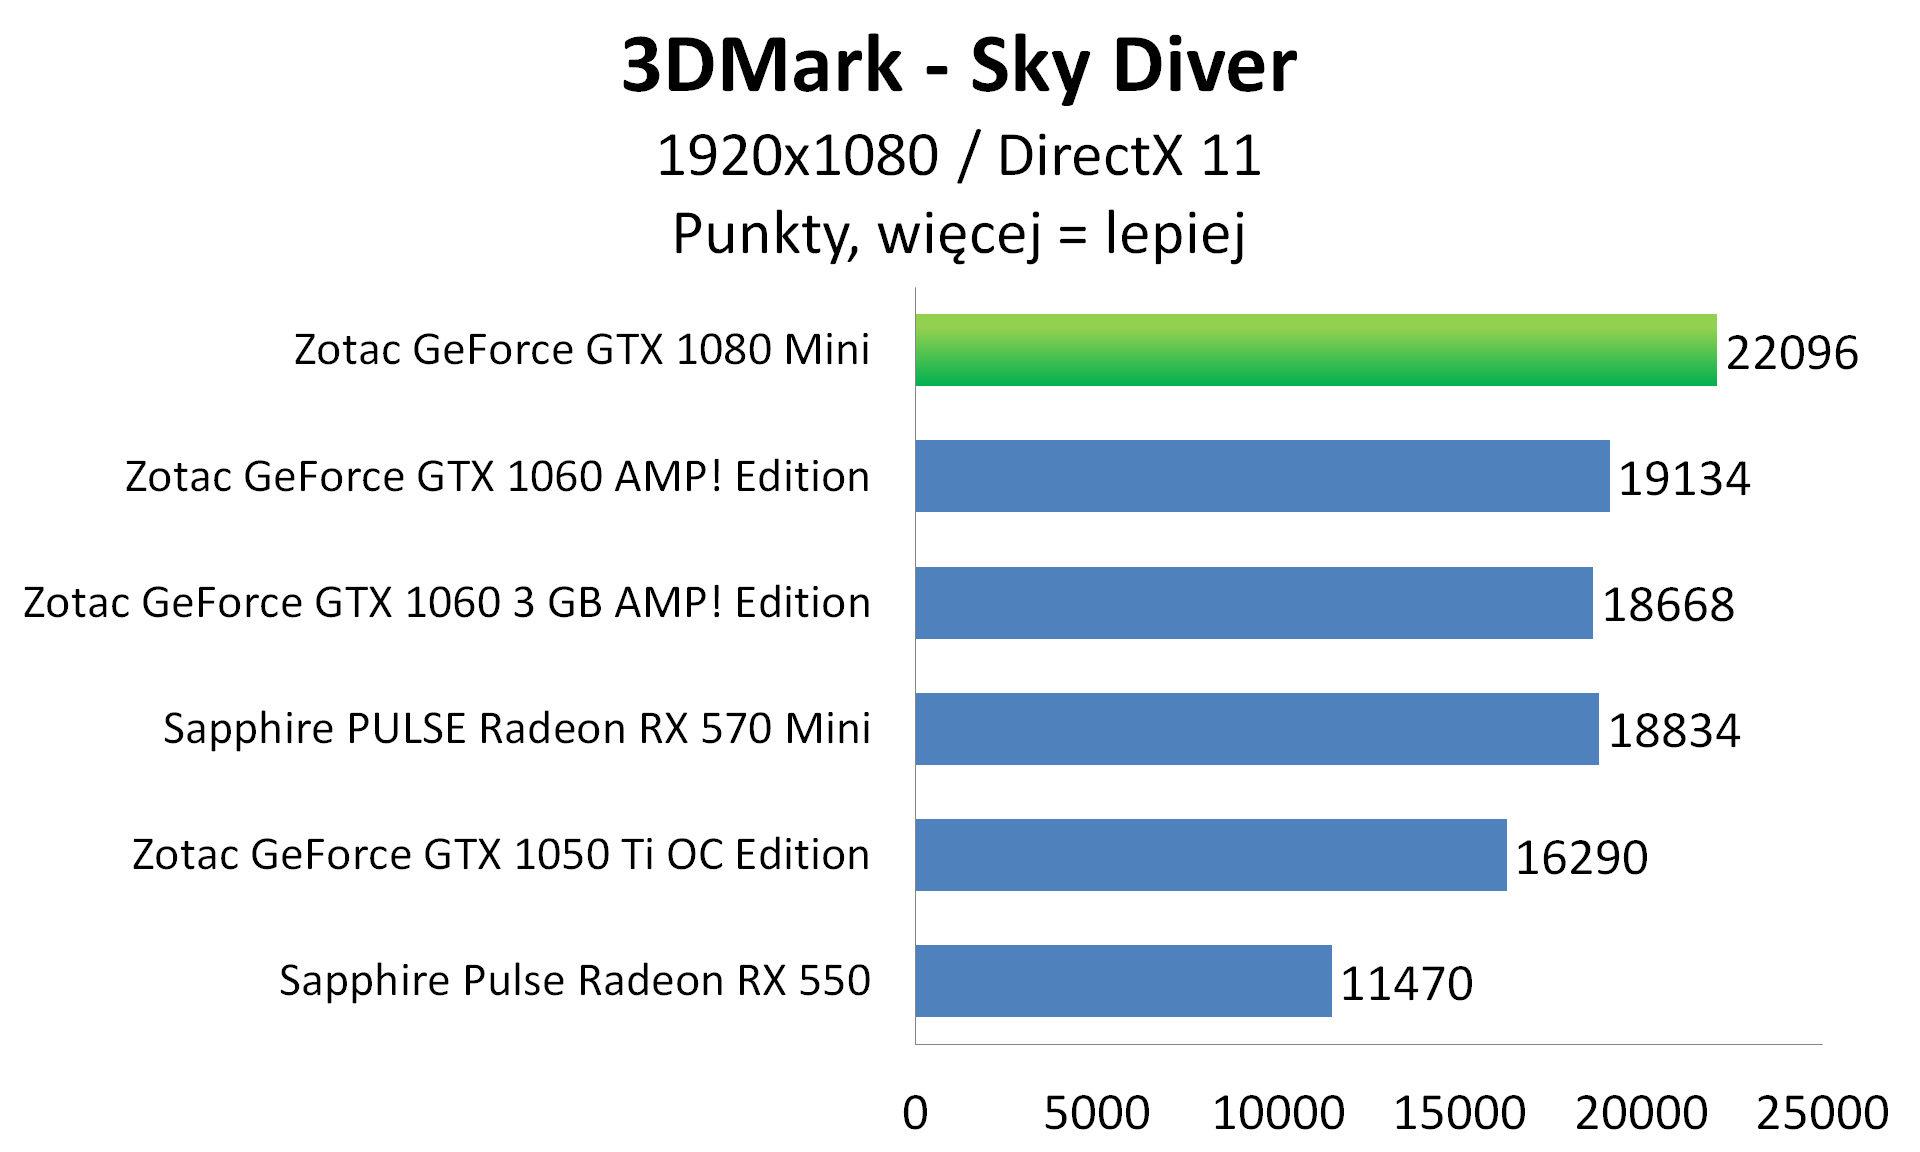 Zotac GeForce GTX 1080 Mini - 3DMark - Sky Diver